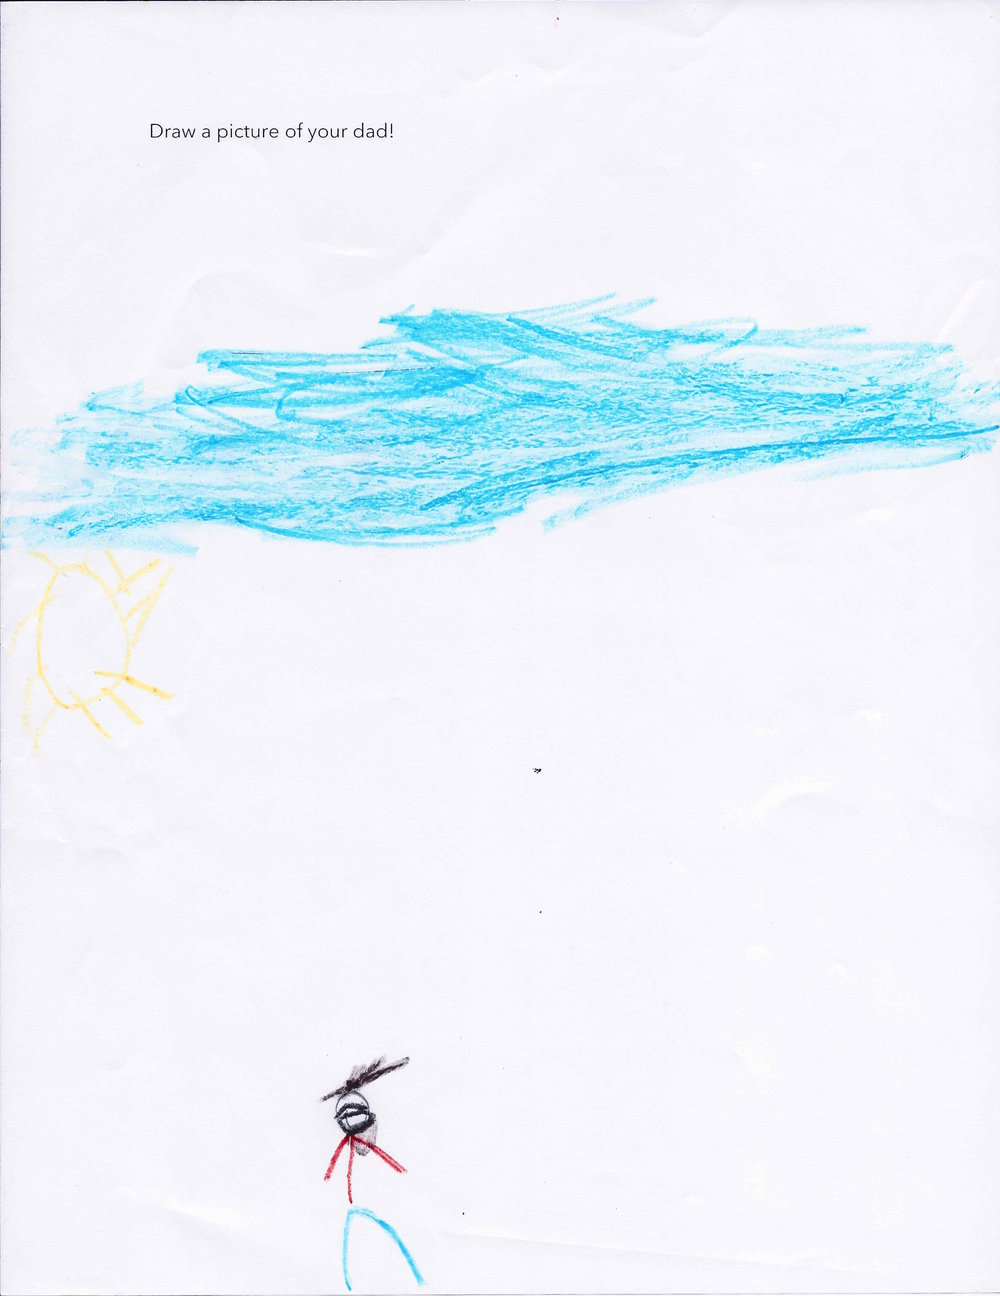 Tayvian's drawing of his dad